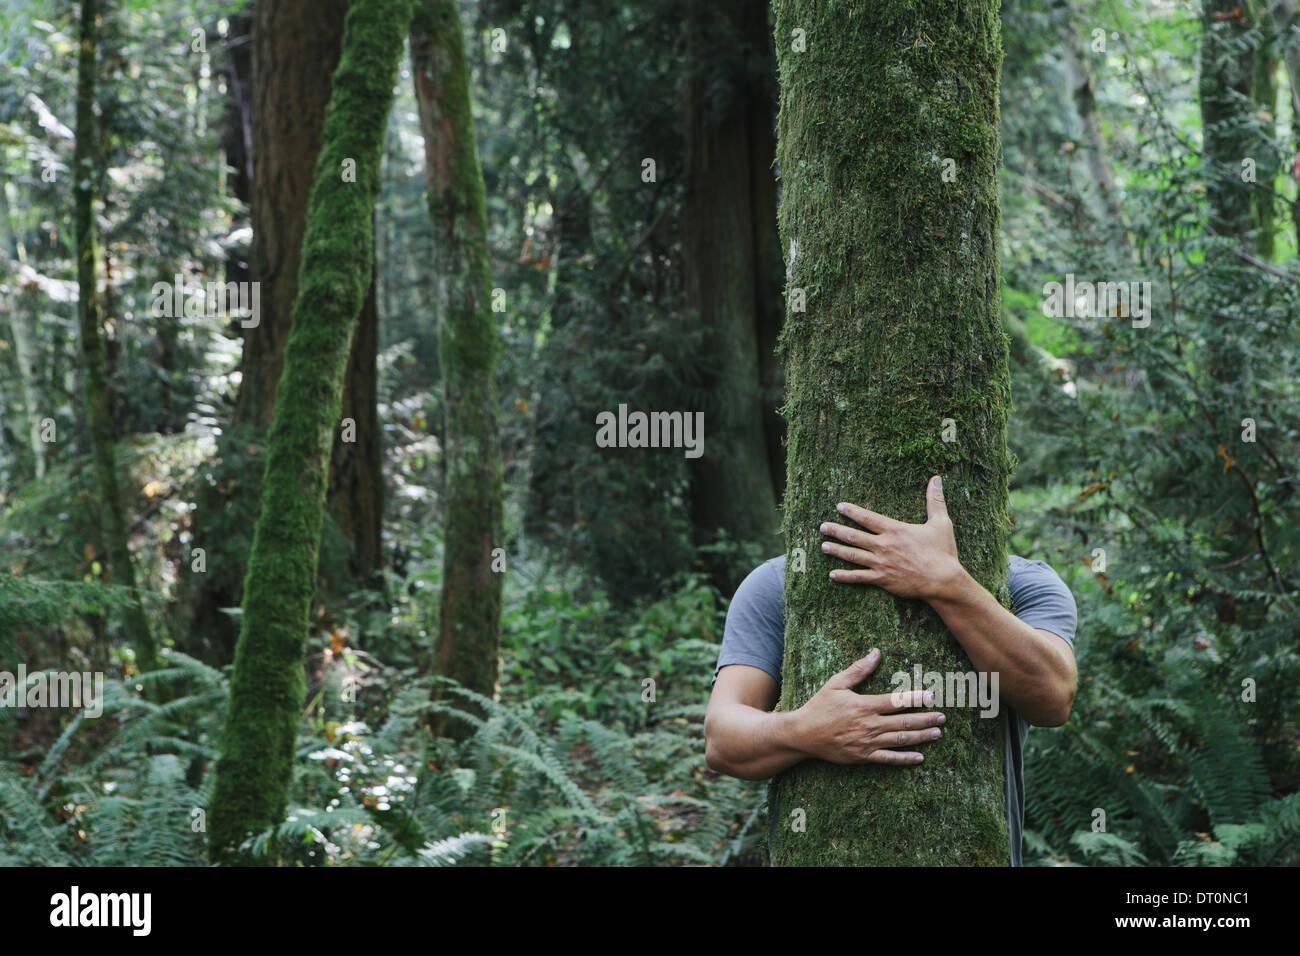 Seattle Washington USA Man hugging tree in lush green forest - Stock Image